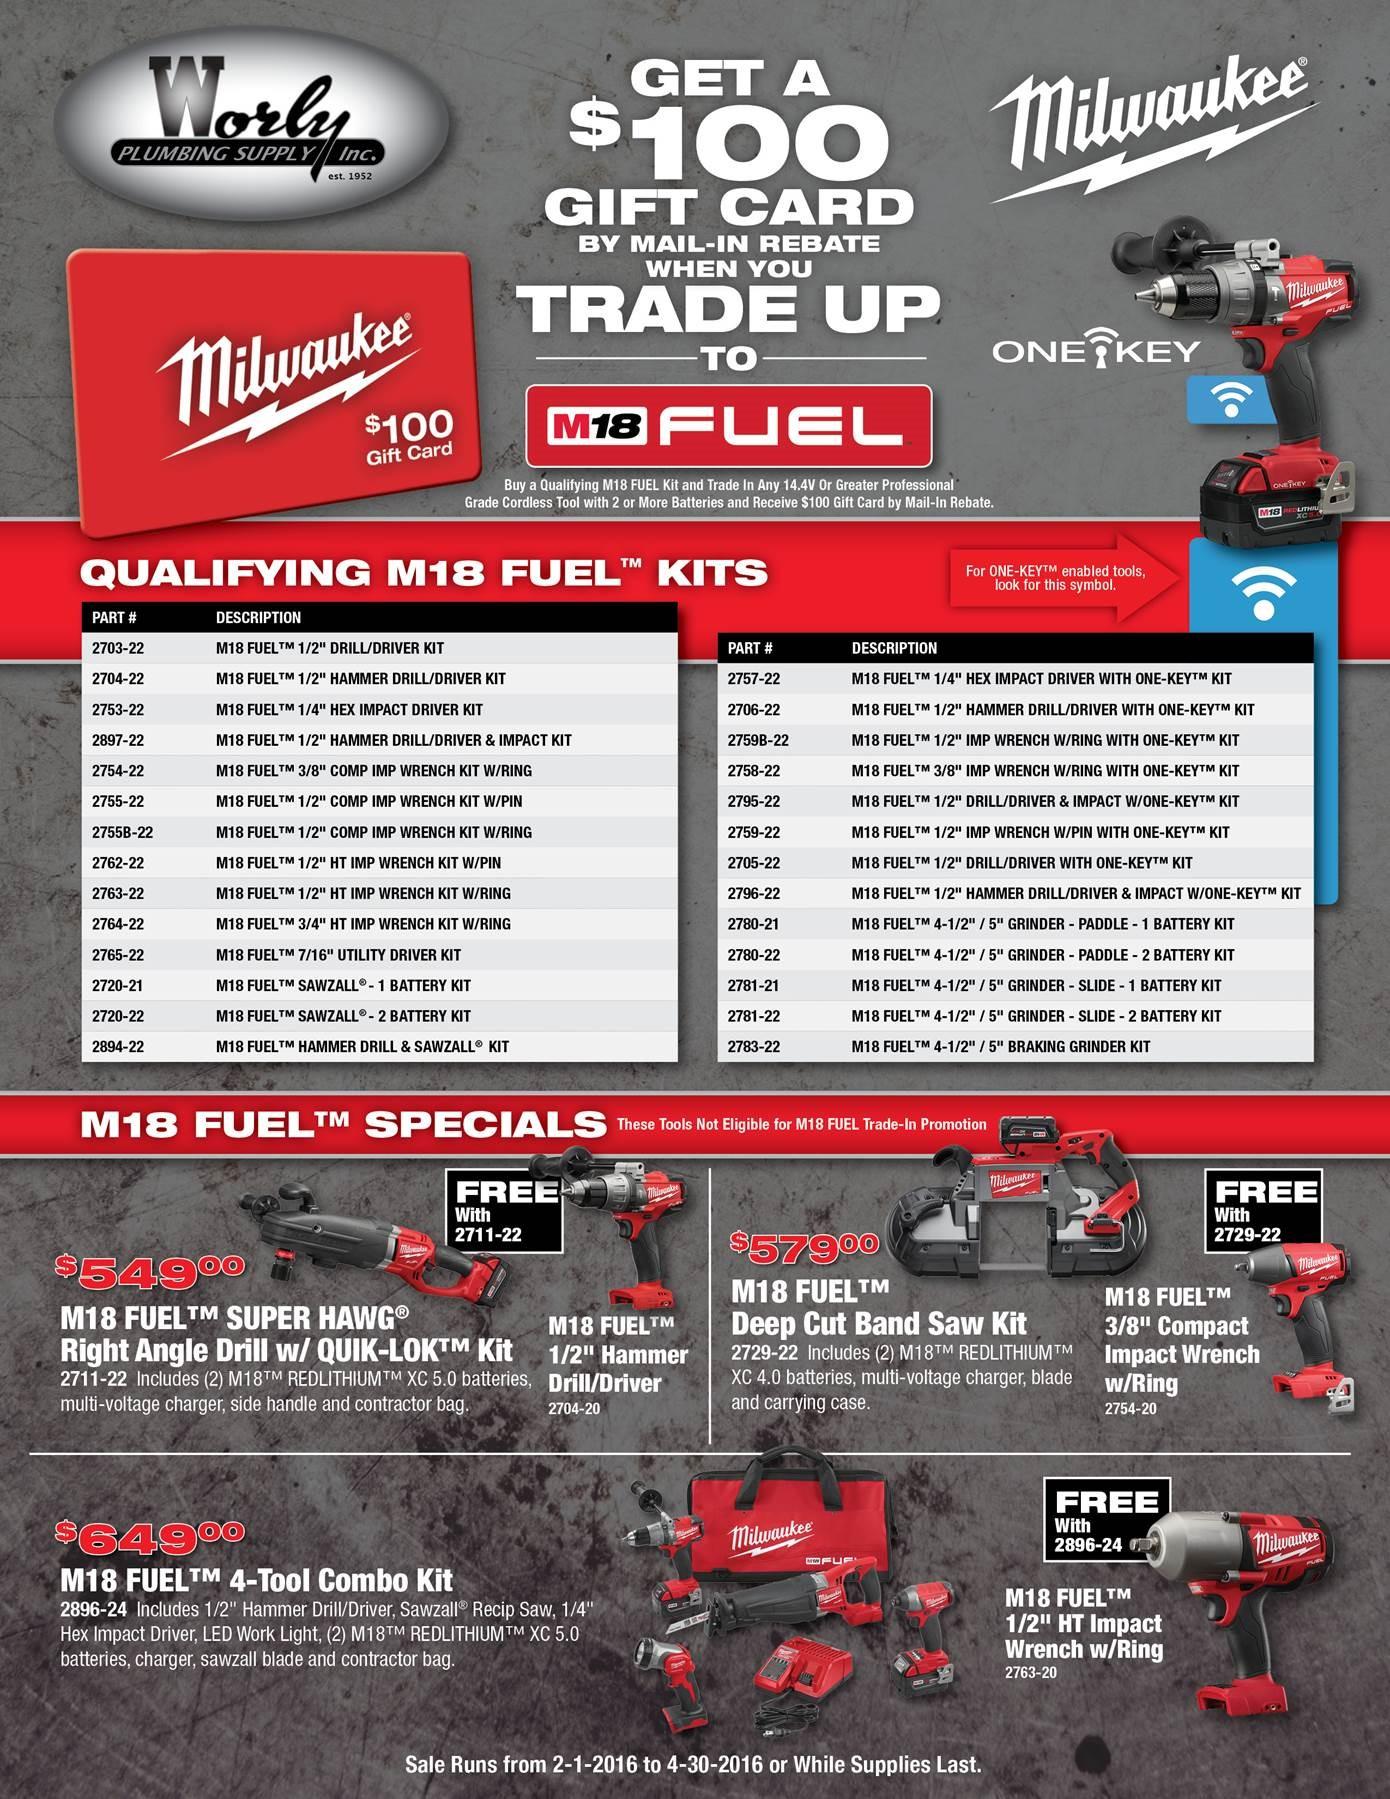 Trade Up to Milwaukee Tools Worly Plumbing Supply